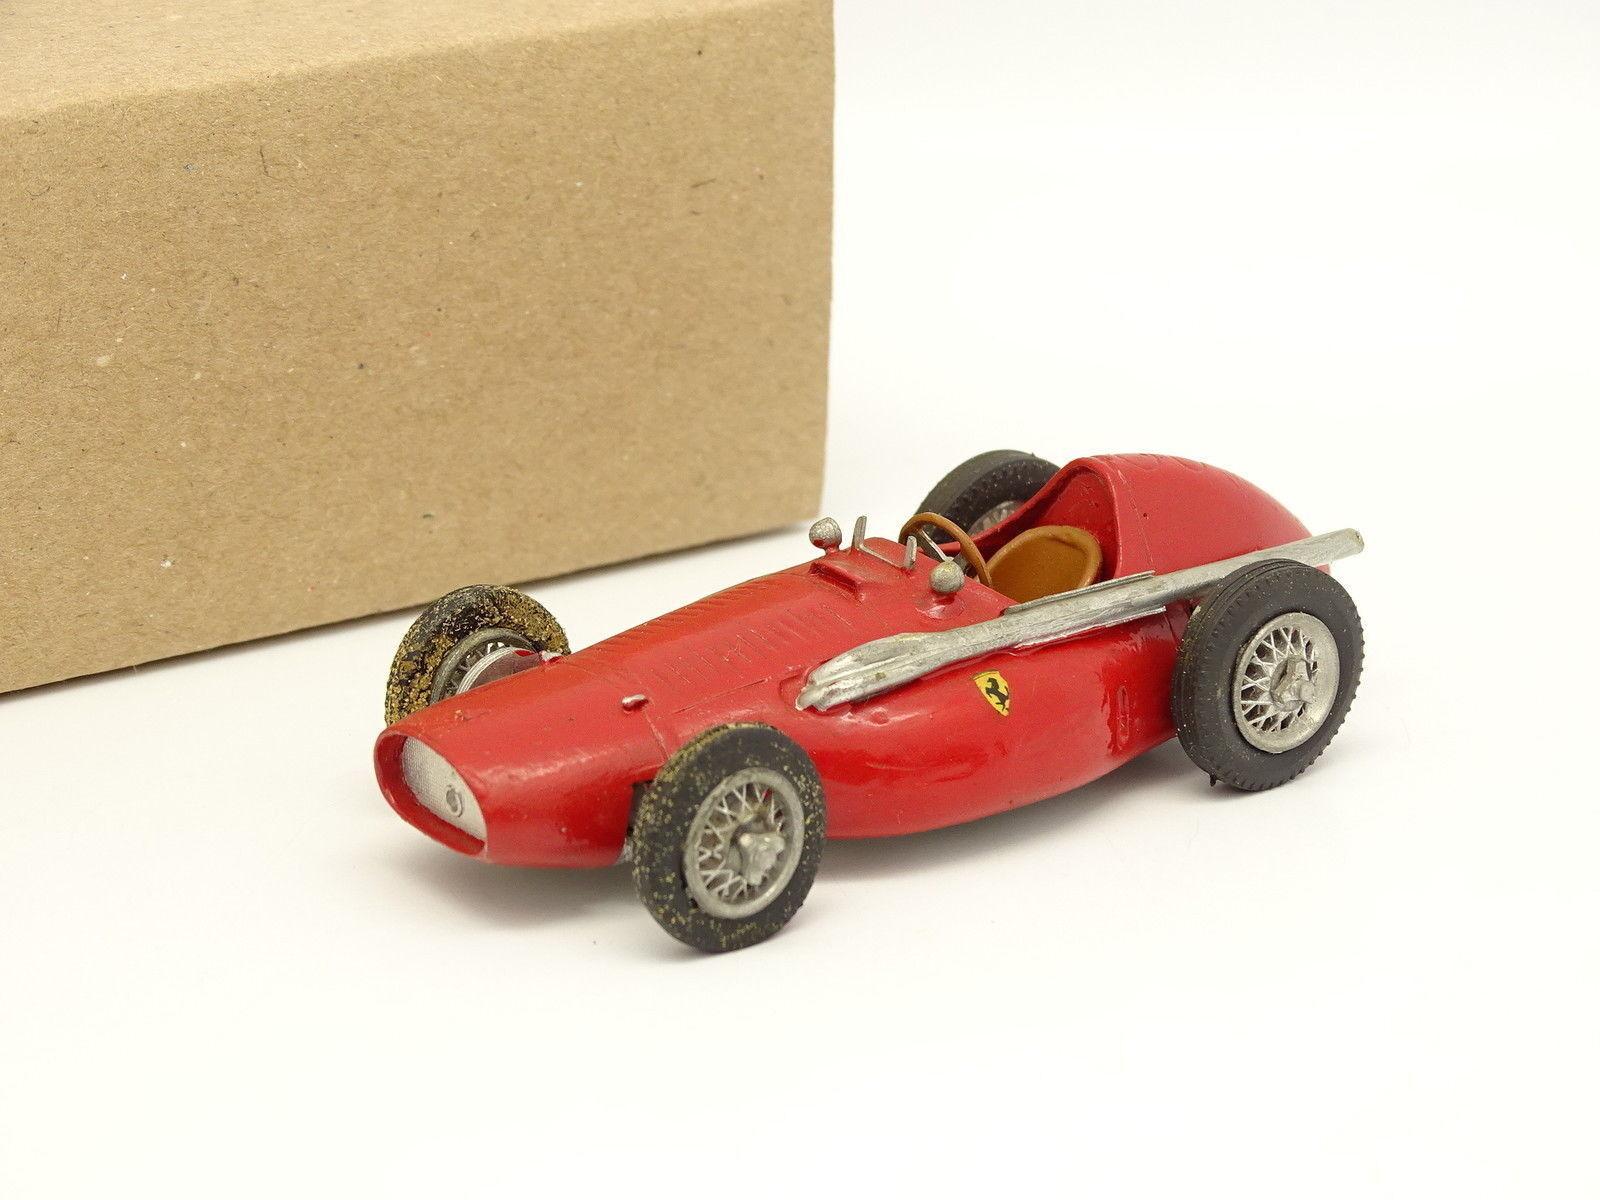 Grand Prix Models Kit Métal Monté 1 43 - F1 Ferrari 555 1954